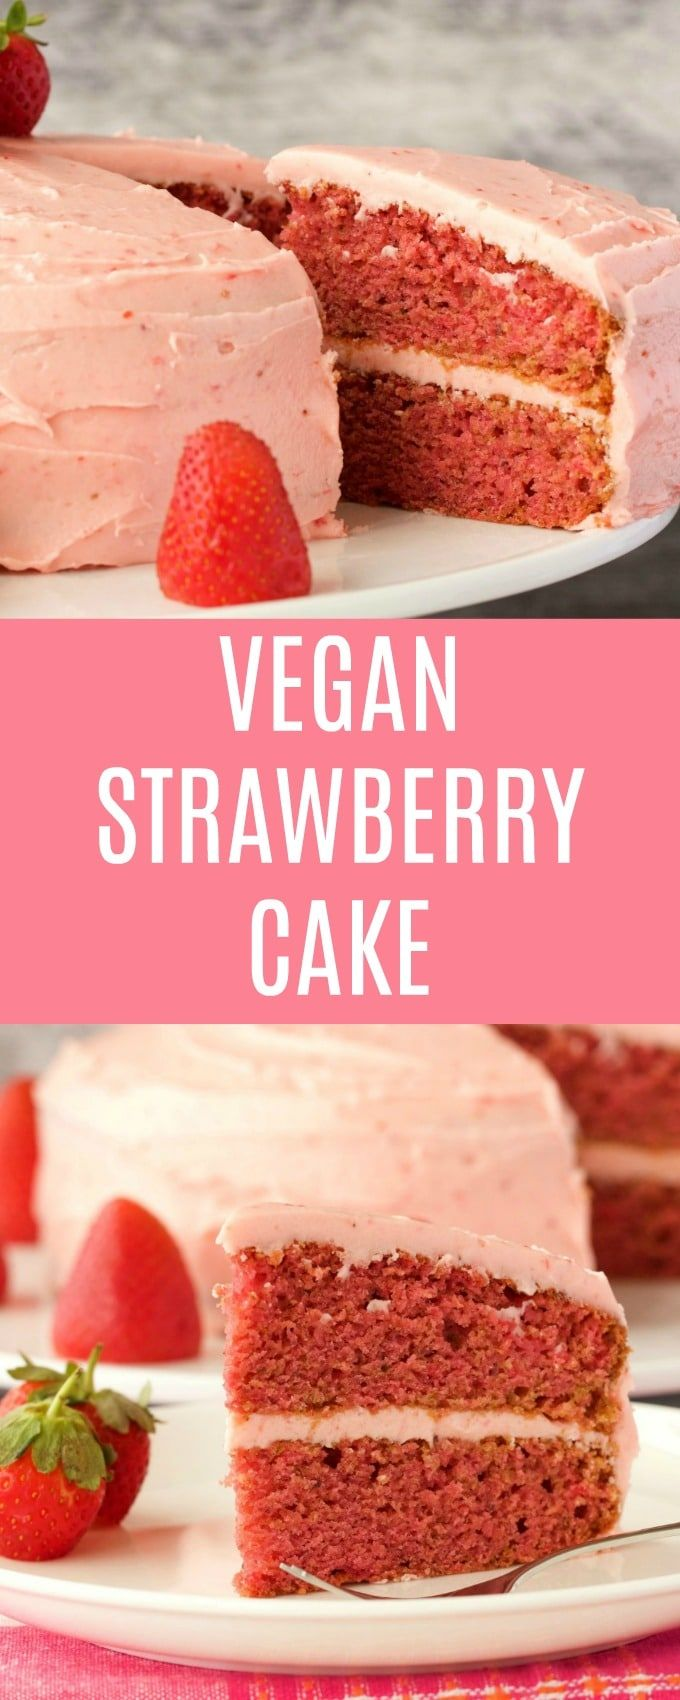 Light, fluffy and deliciously moist vegan strawberry cake with strawberry frosting. This pretty pink cake is packed with strawberry flavor and goodness. Vegan | Vegan Cake | Vegan Dessert | Dairy Free | #vegan #lovingitvegan #vegancake #dairyfree #dessert | lovingitvegan.com